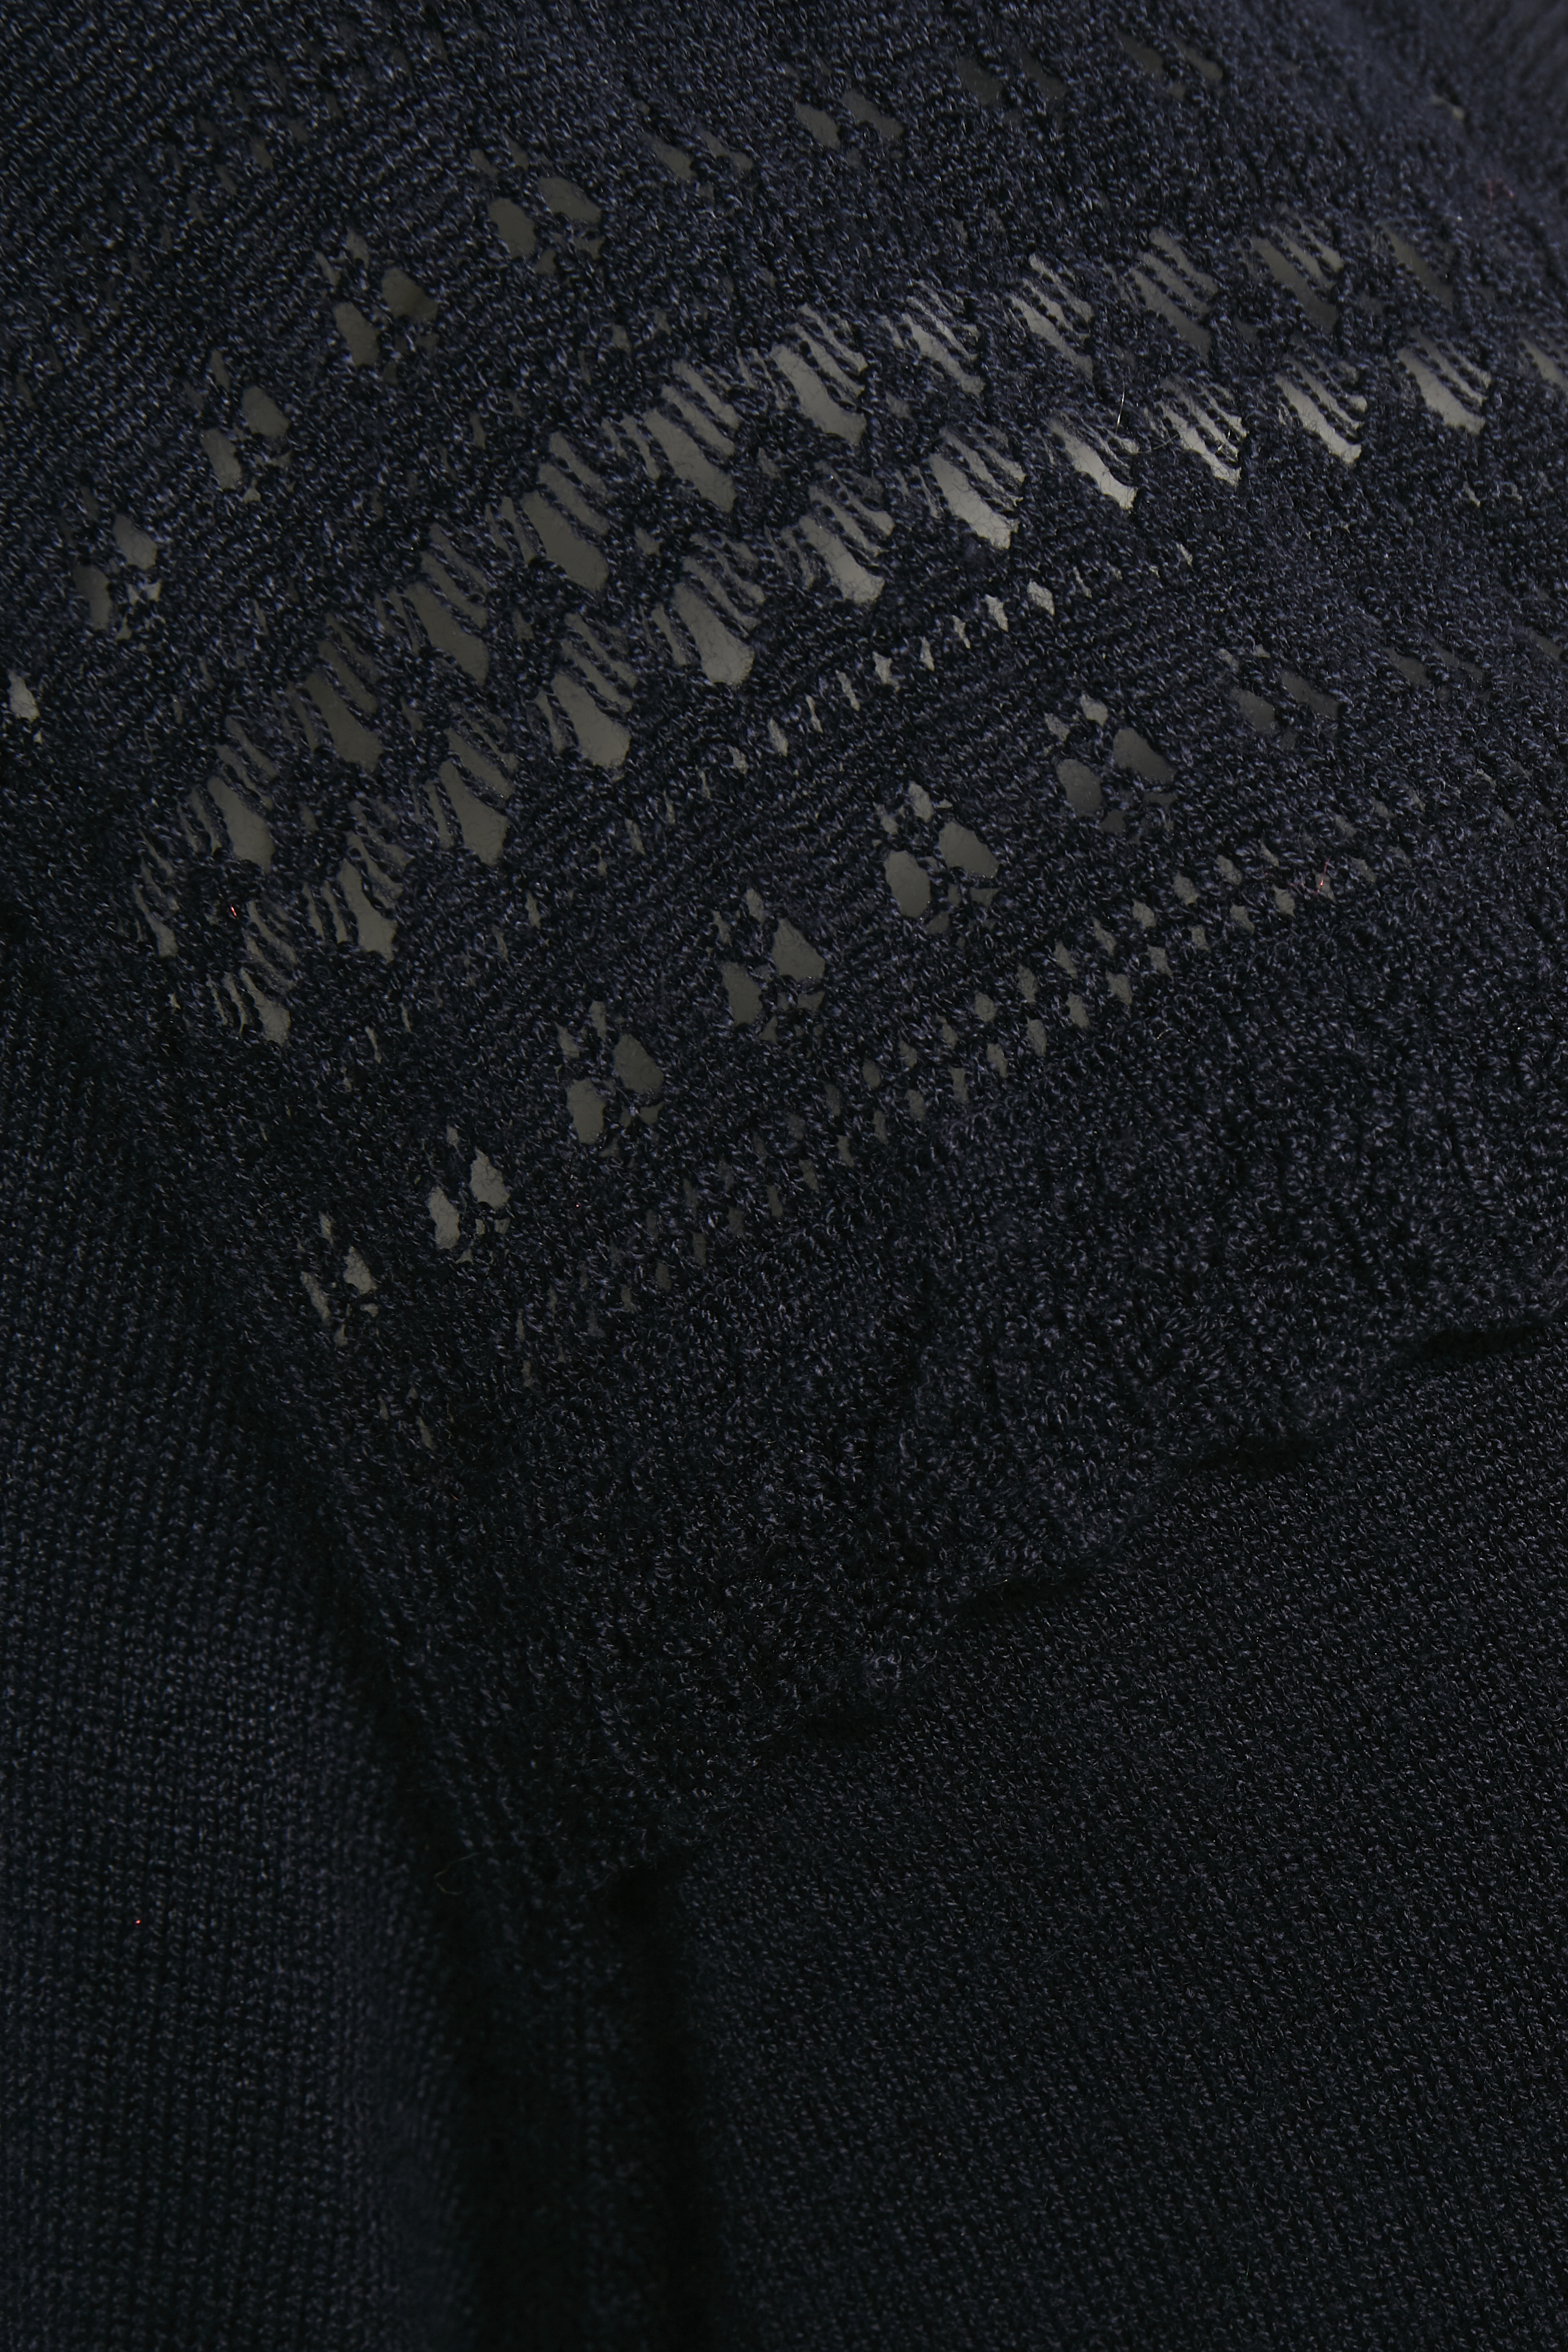 Marineblau Tunika von Kaffe – Shoppen SieMarineblau Tunika ab Gr. XS-XXL hier